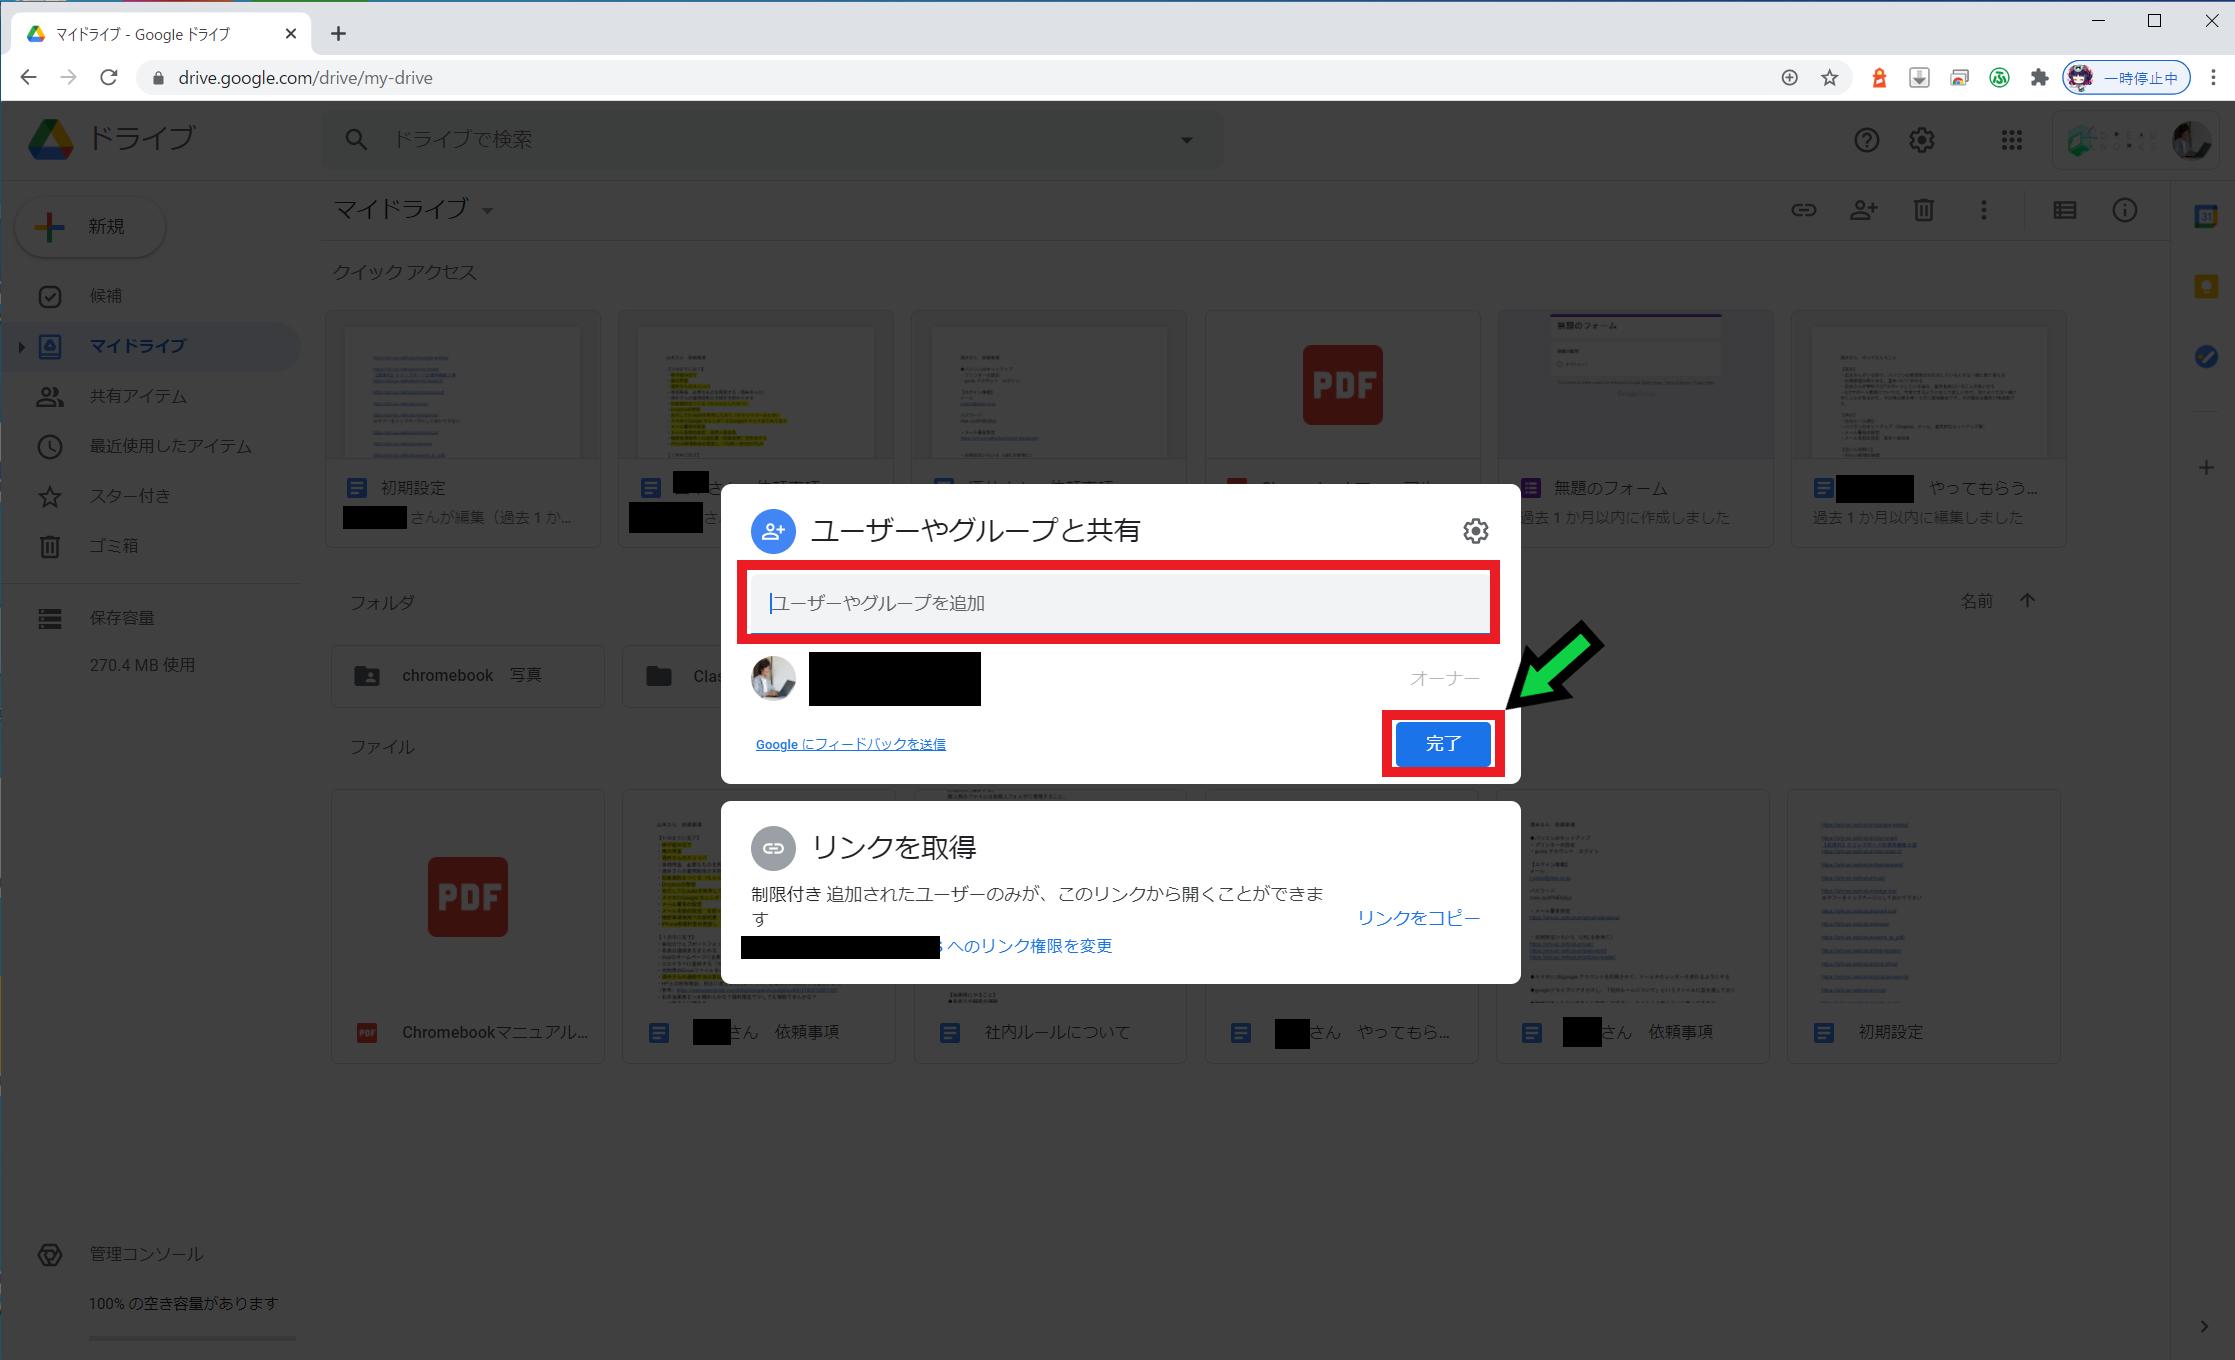 Google Driveの基本的な操作方法、使用方法の解説【GIGAスクール関連】